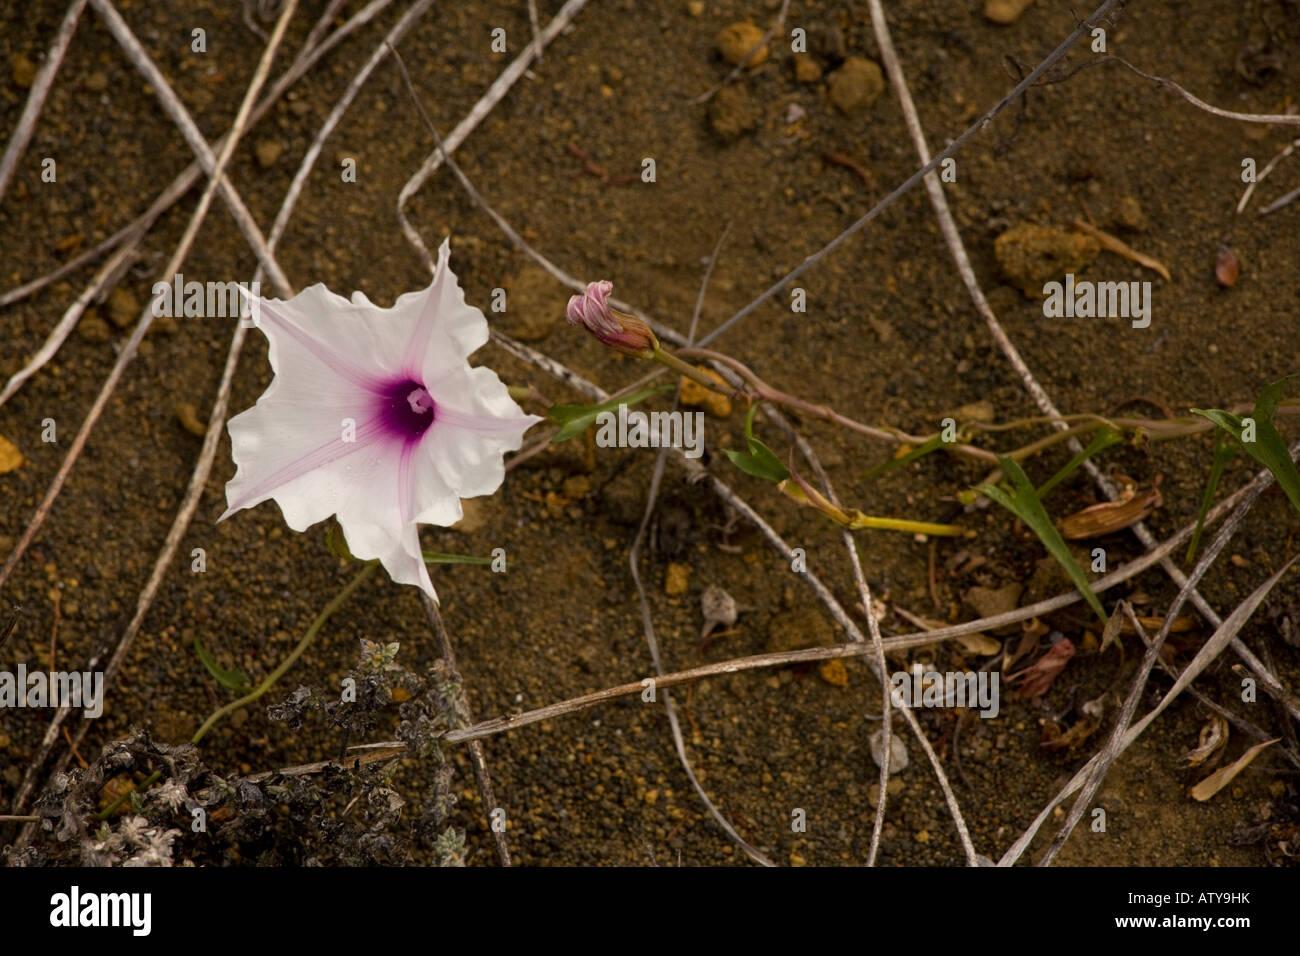 Arrow-leaved morning glory (Ipomoea linearifolia) endemic plant, close-up, Santiago Island, Galapagos Islands - Stock Image